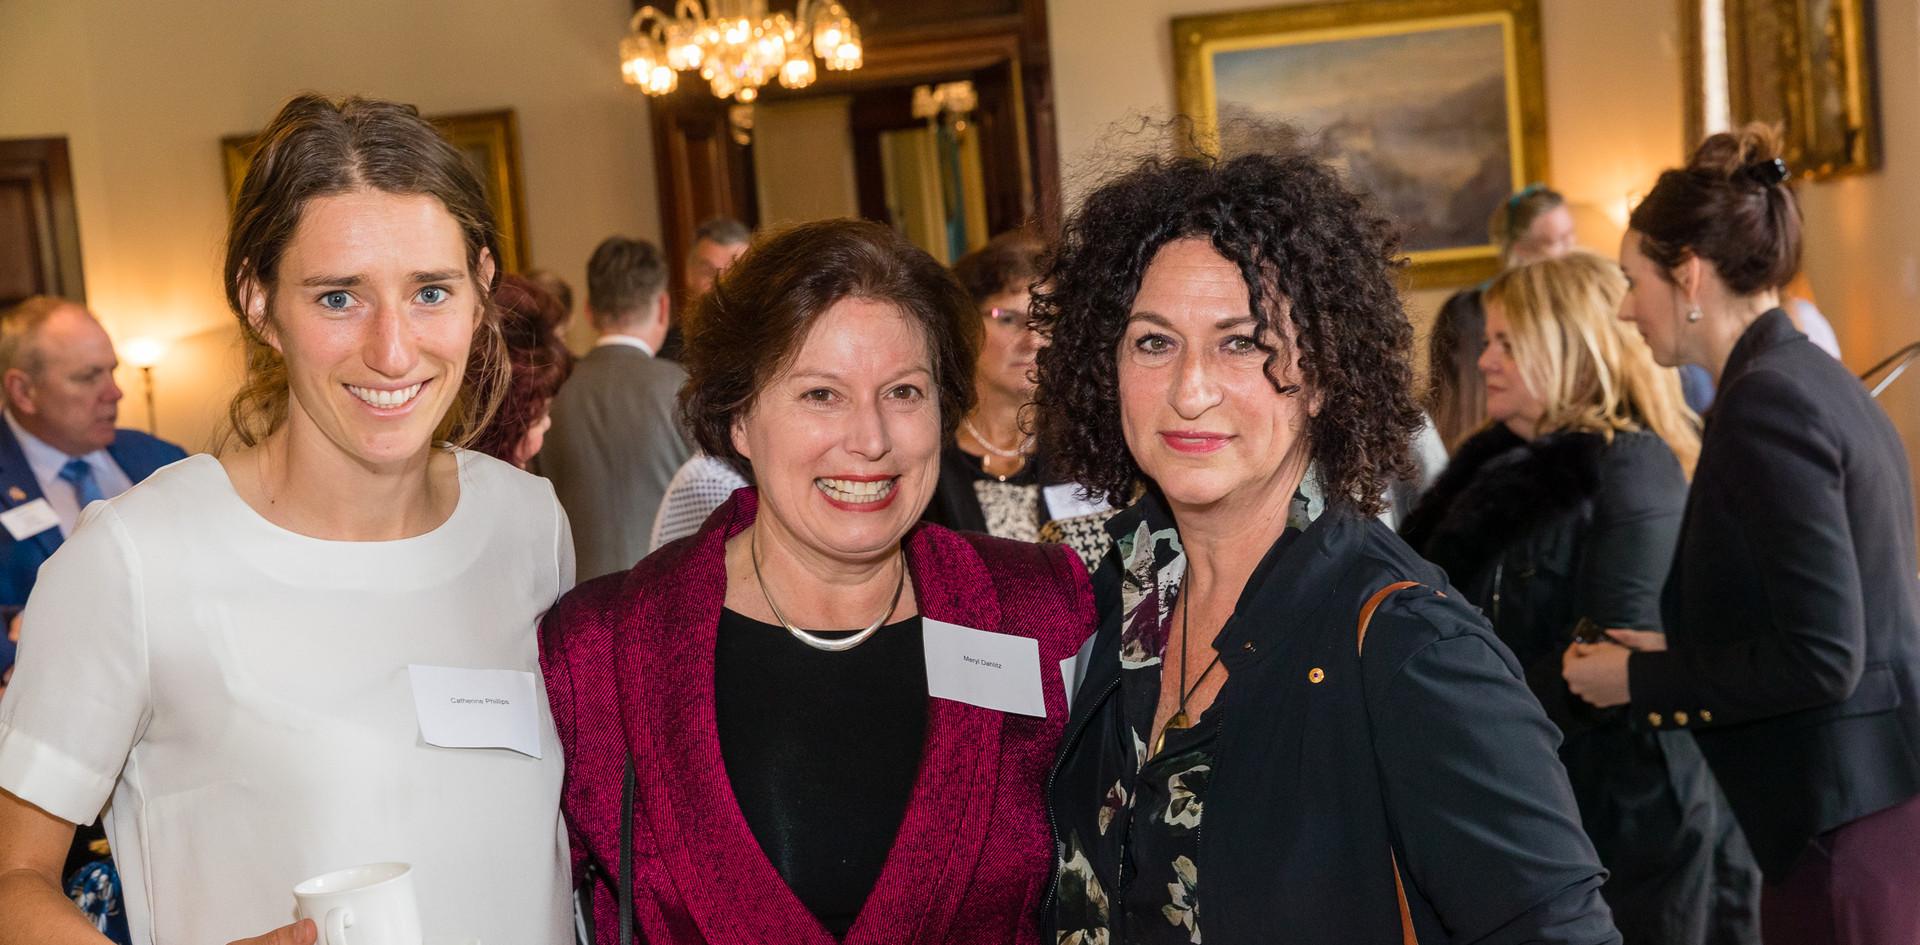 Catherine, Meryl and friend.jpg